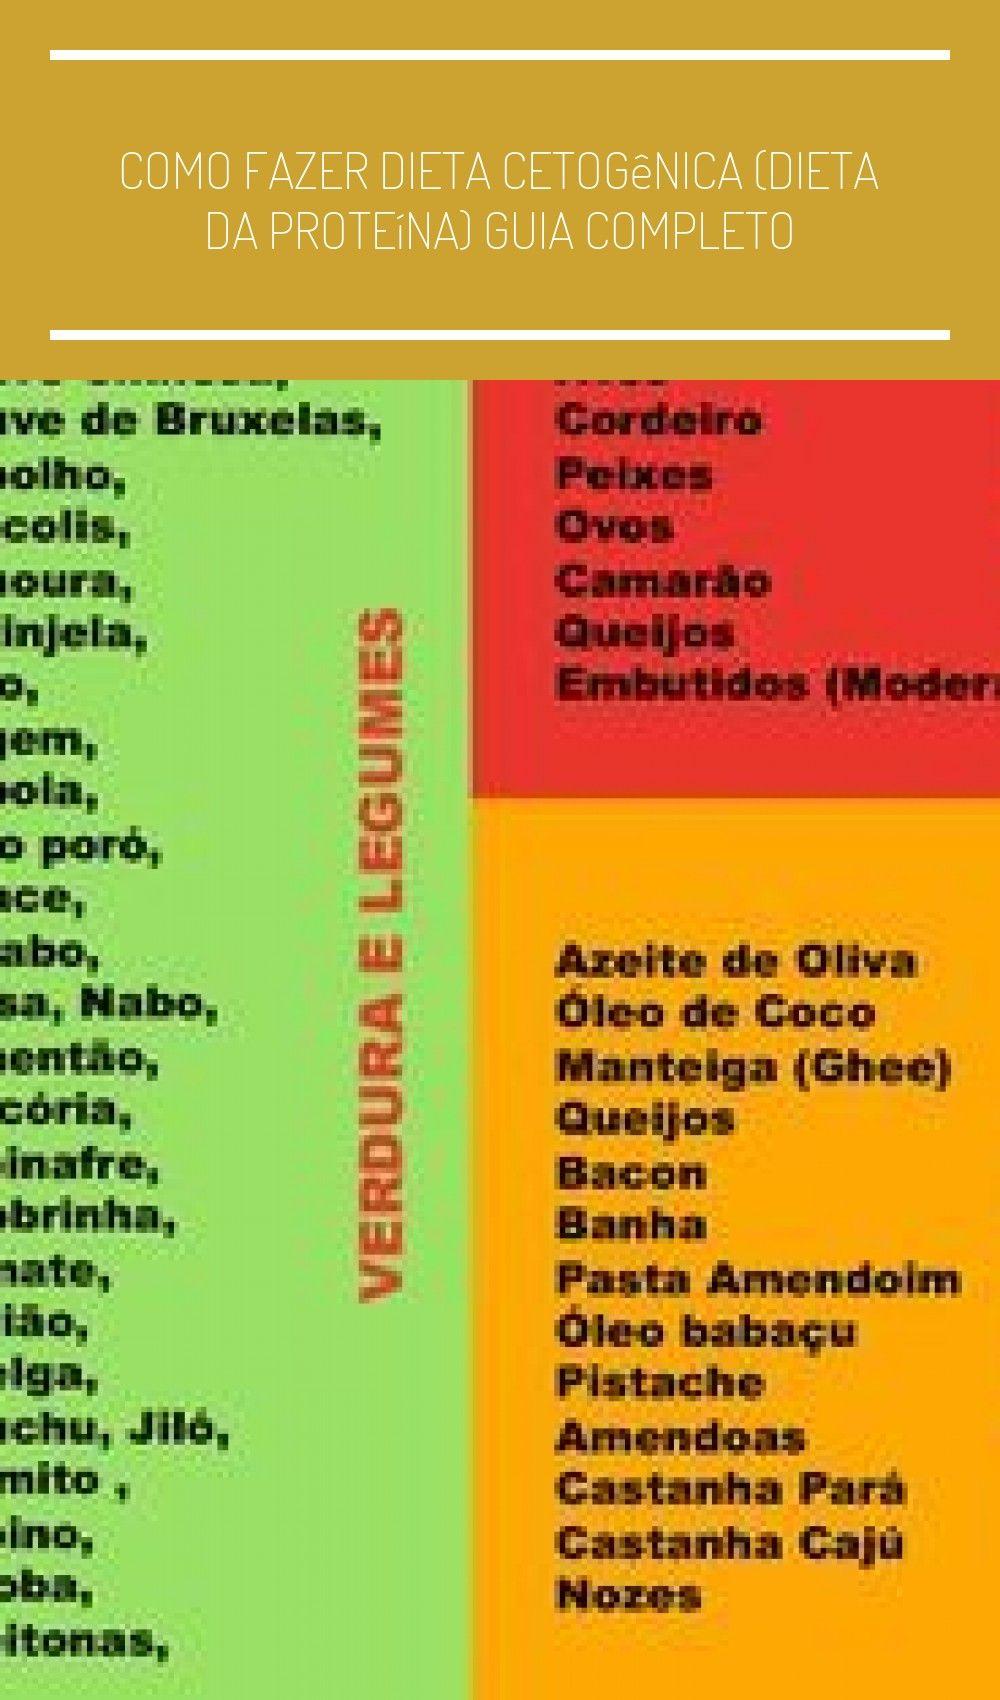 Dieta Cetogenica Cardapio Semanal Completo Comece Hoje Dieta Cetogenica Receitas Cardapio Semanal Dieta Dieta